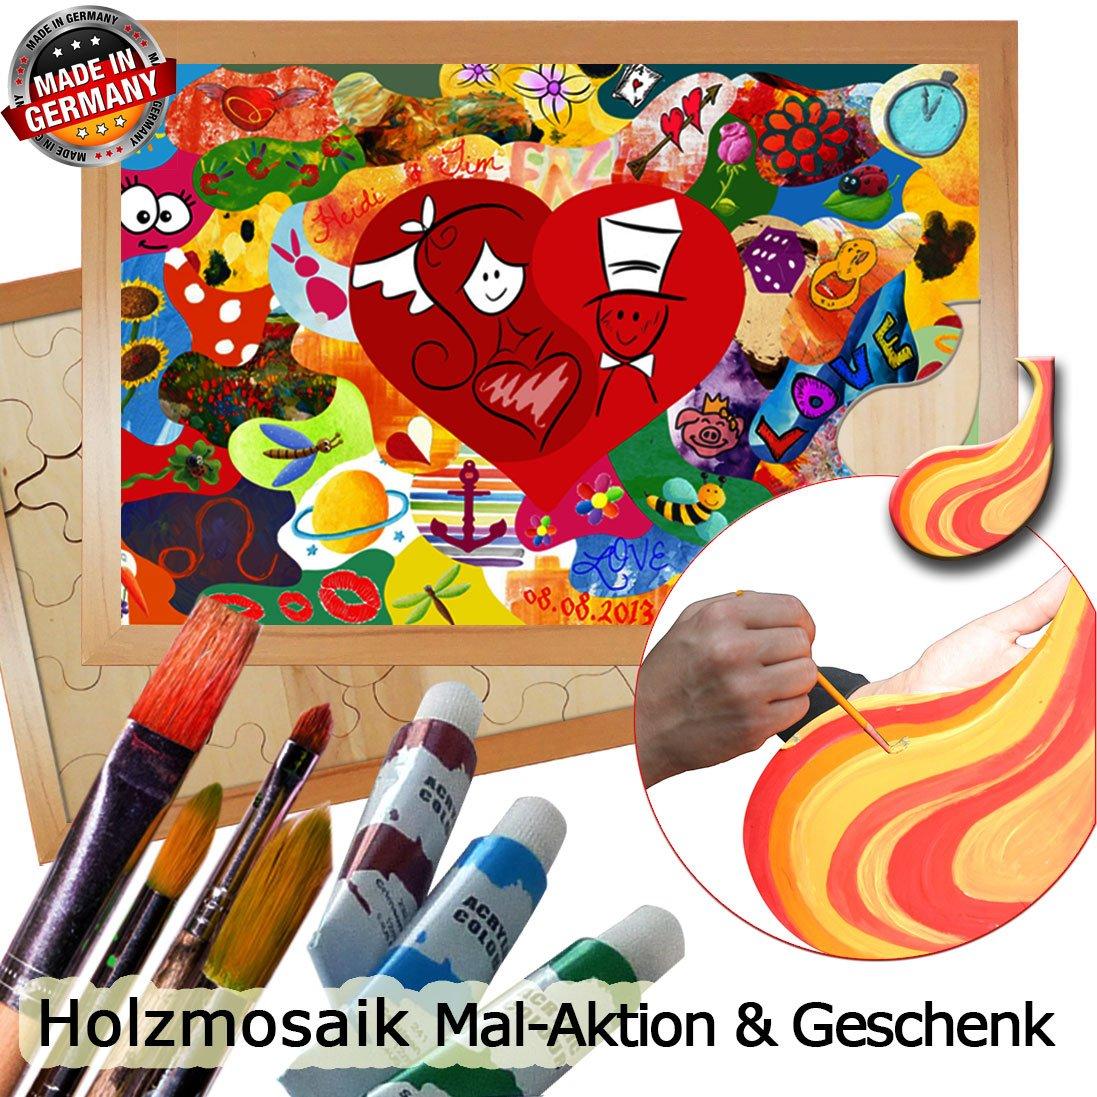 Holzpuzzle zur Hochzeit Hochzeit Hochzeit – Holzmosaik zum Bemalen, Rahmen Weiss, ca. 45 Holz-Puzzle-Teile (80x55 cm) B00JVS49C2 | Optimaler Preis  e21197